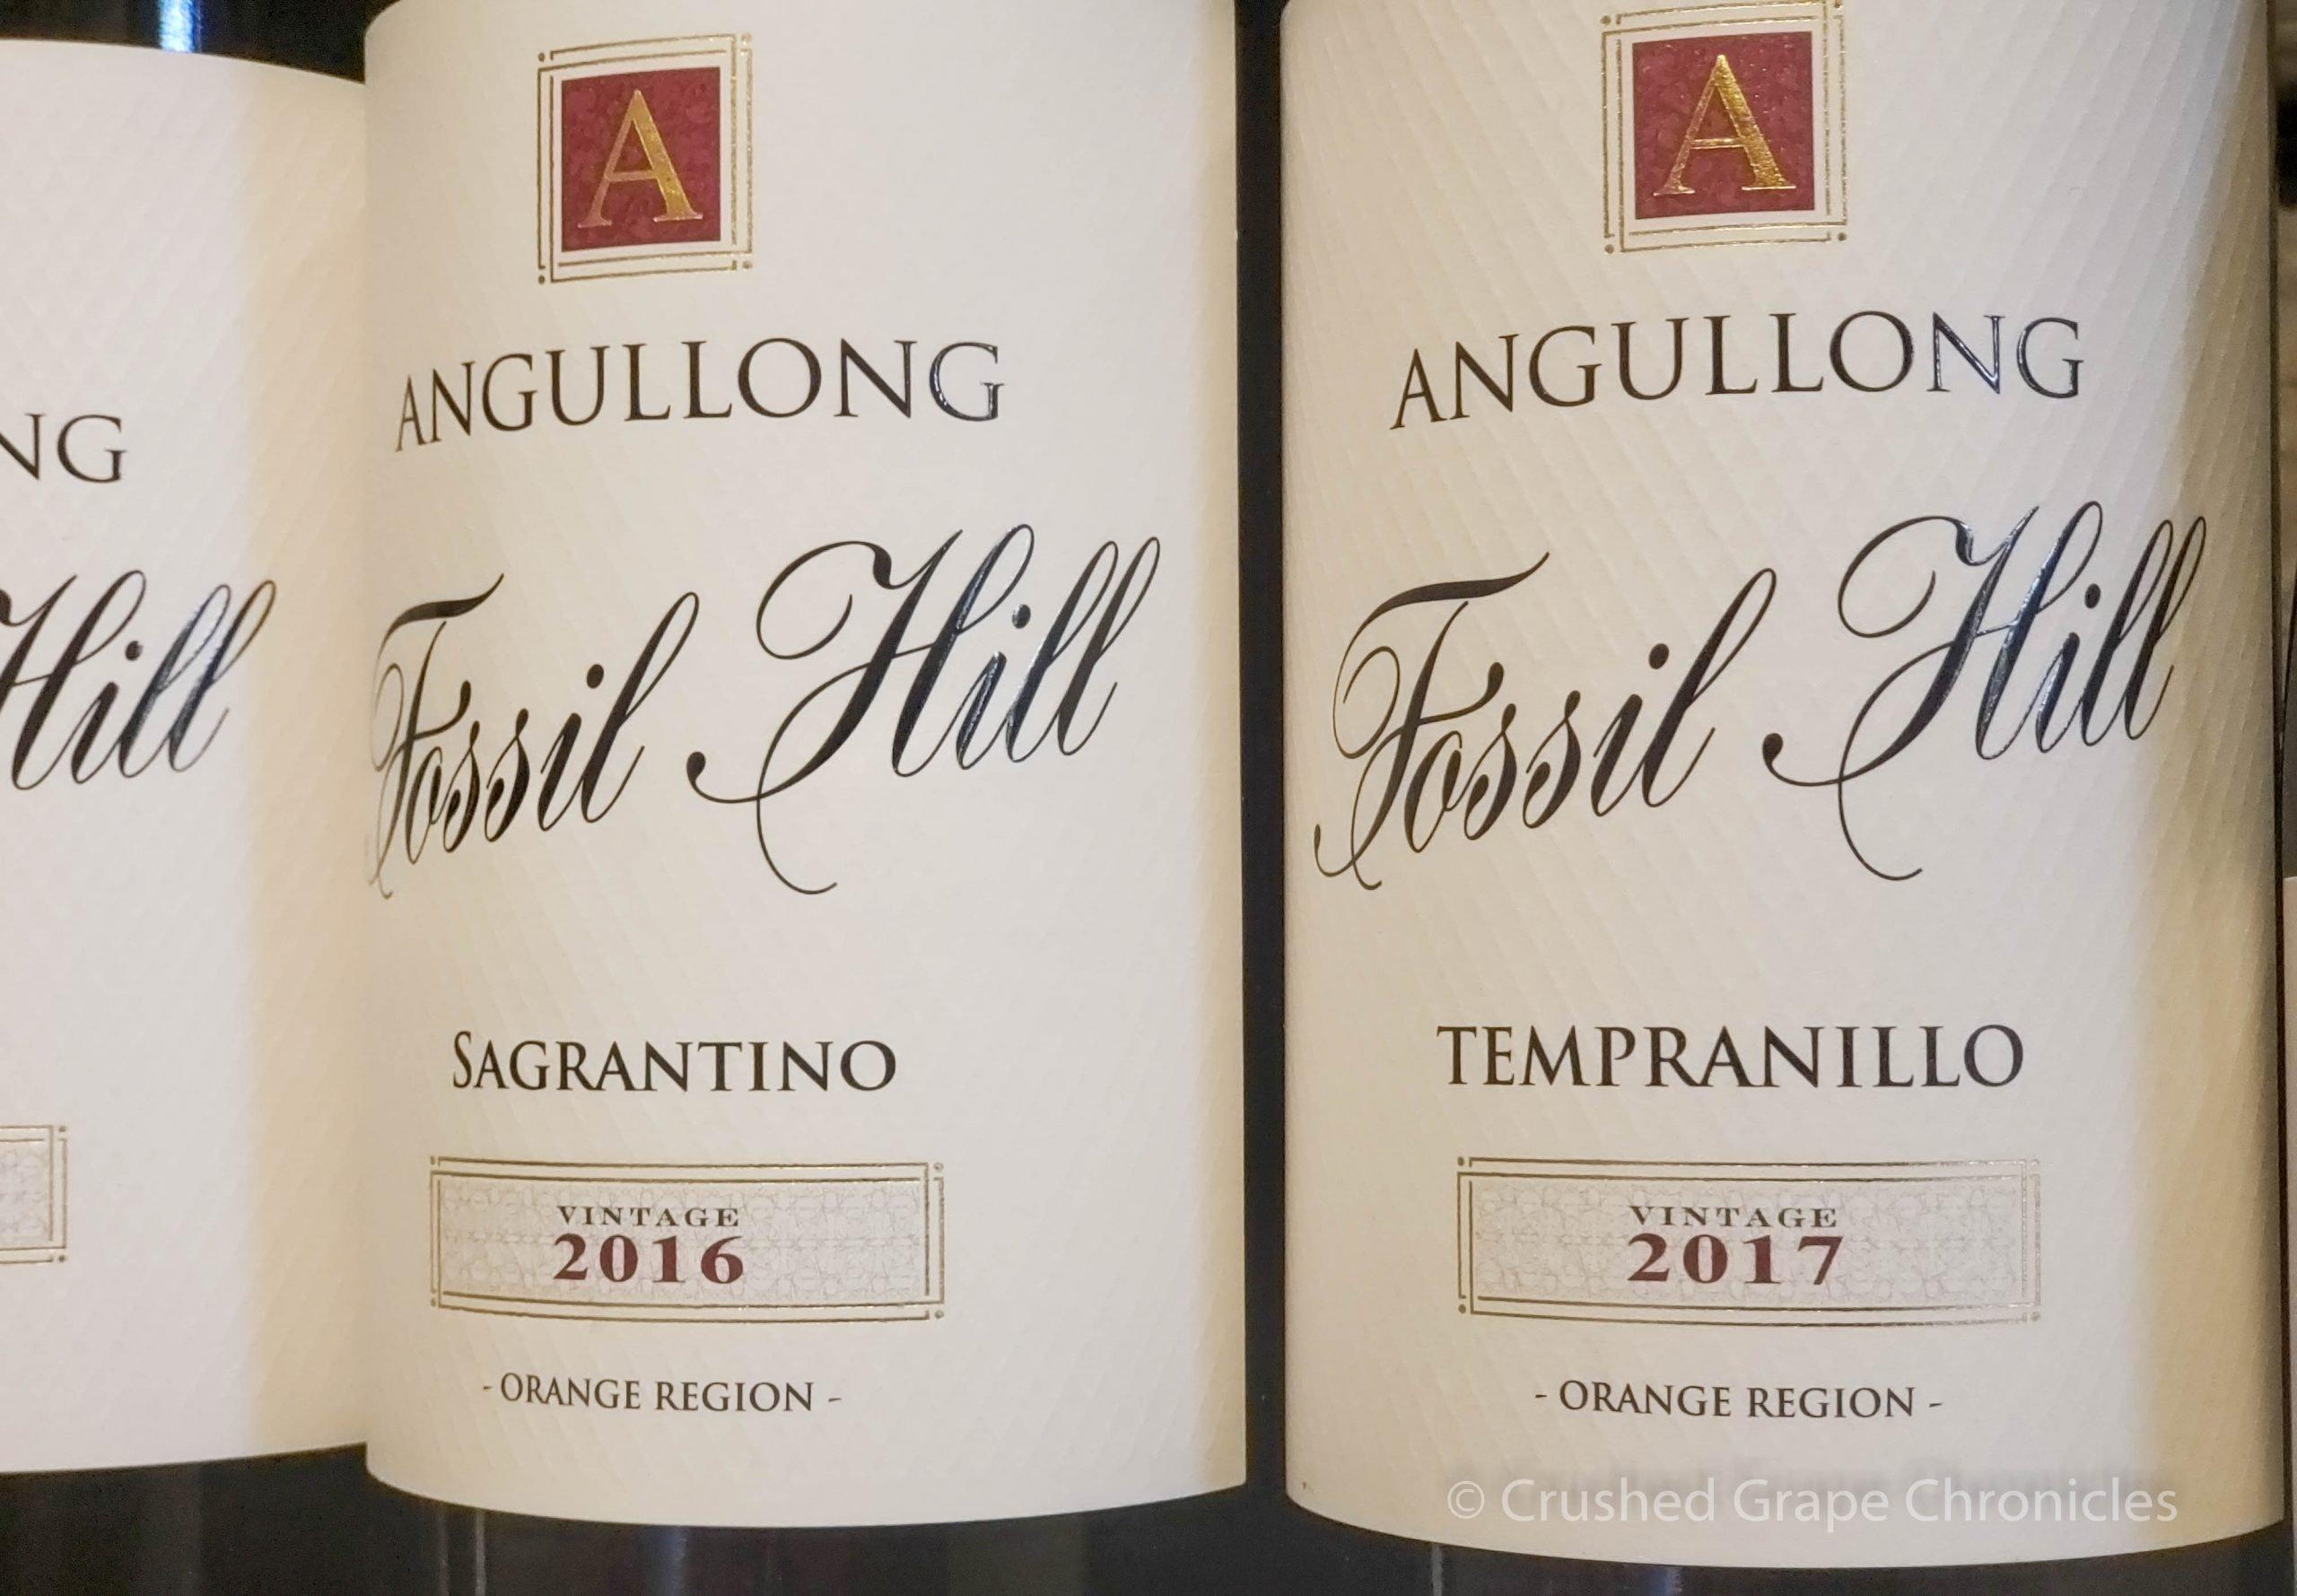 Angullong 2017 Tempranillo and 2016 Sagrantino at Angullong Vineyard in Cellar Door in Millthorpe, Orange NSW Australia